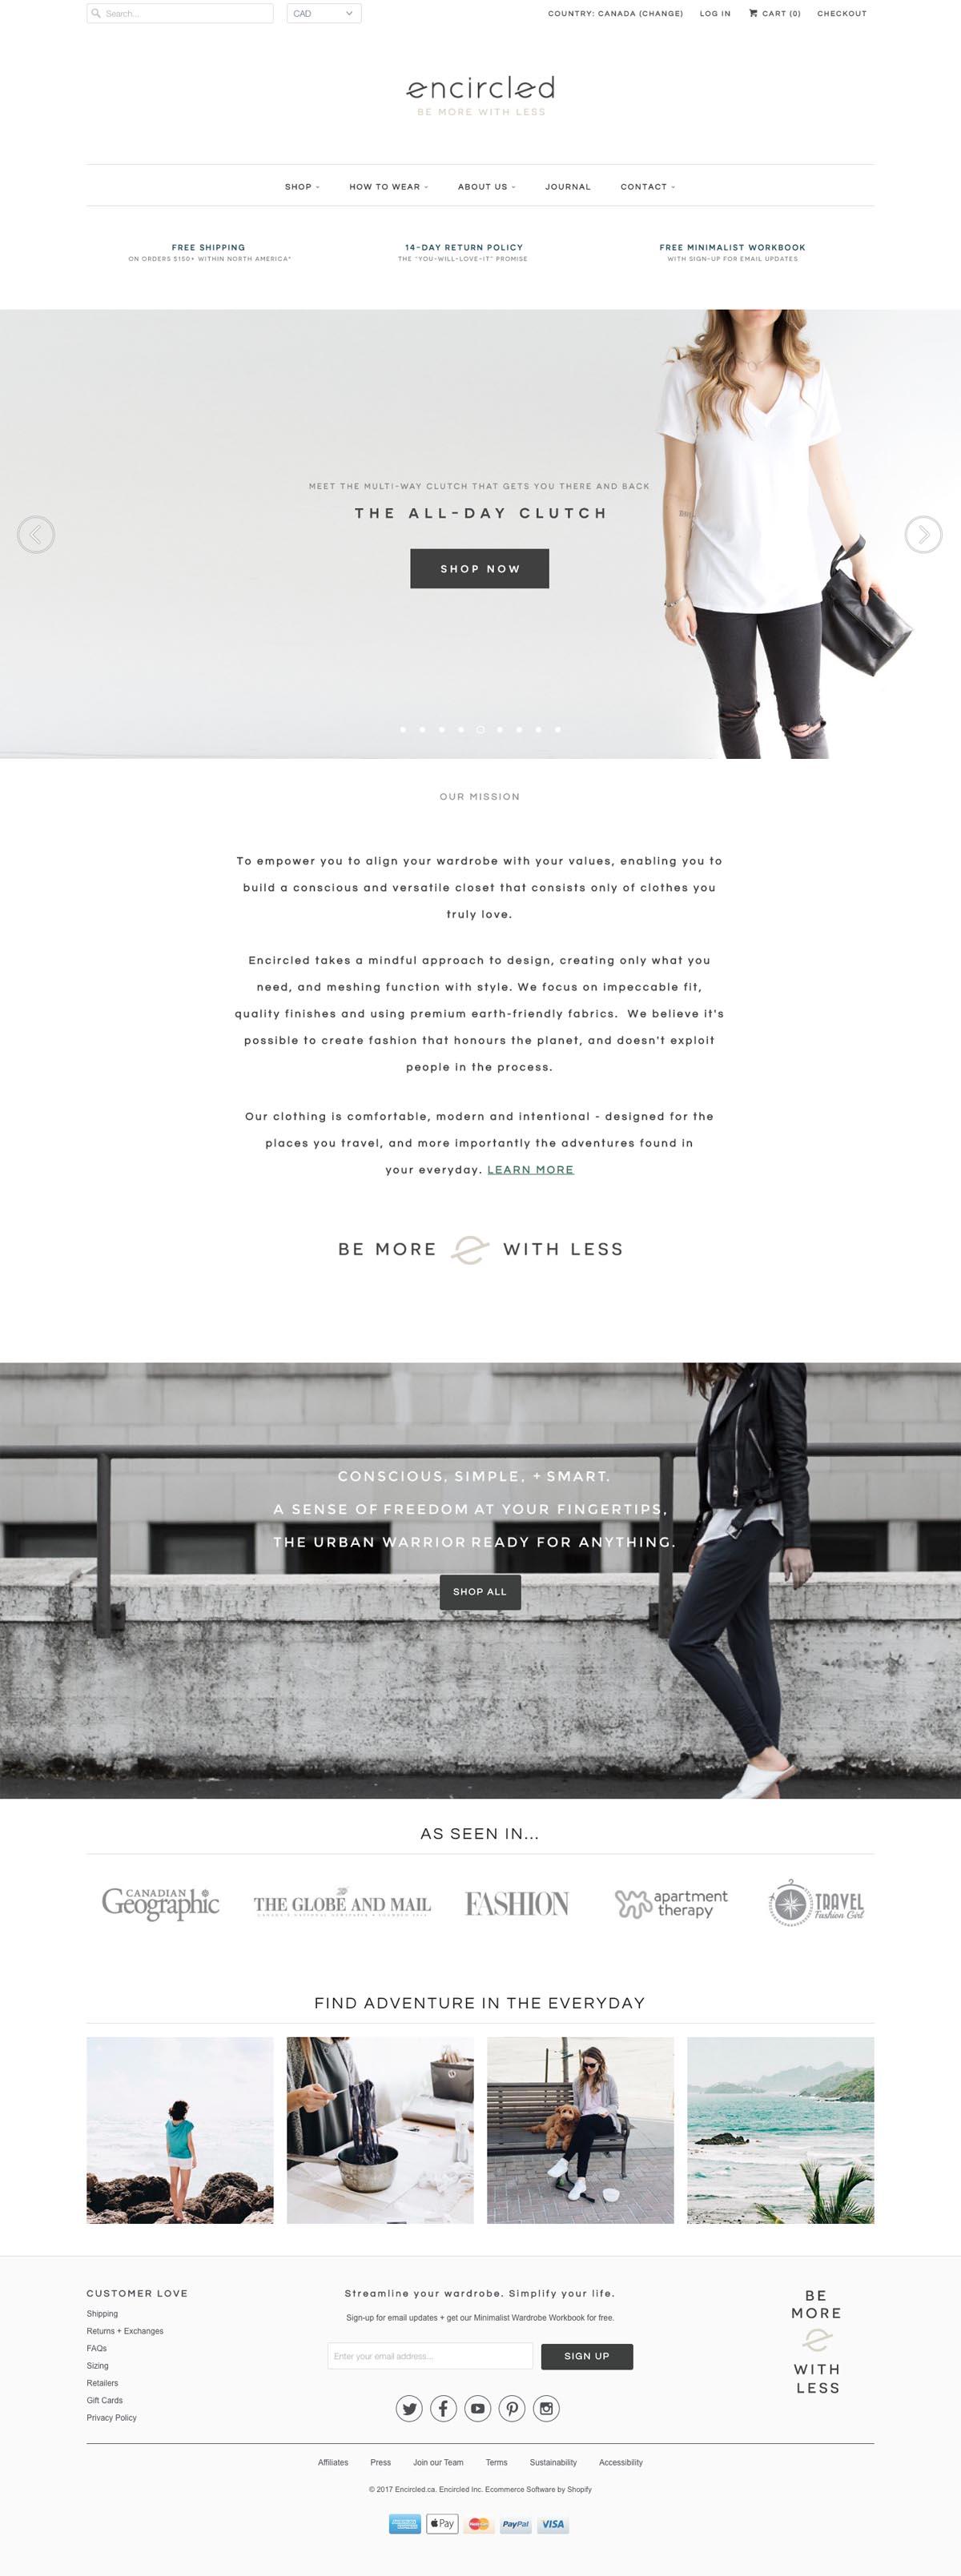 eCommerce website: encircled